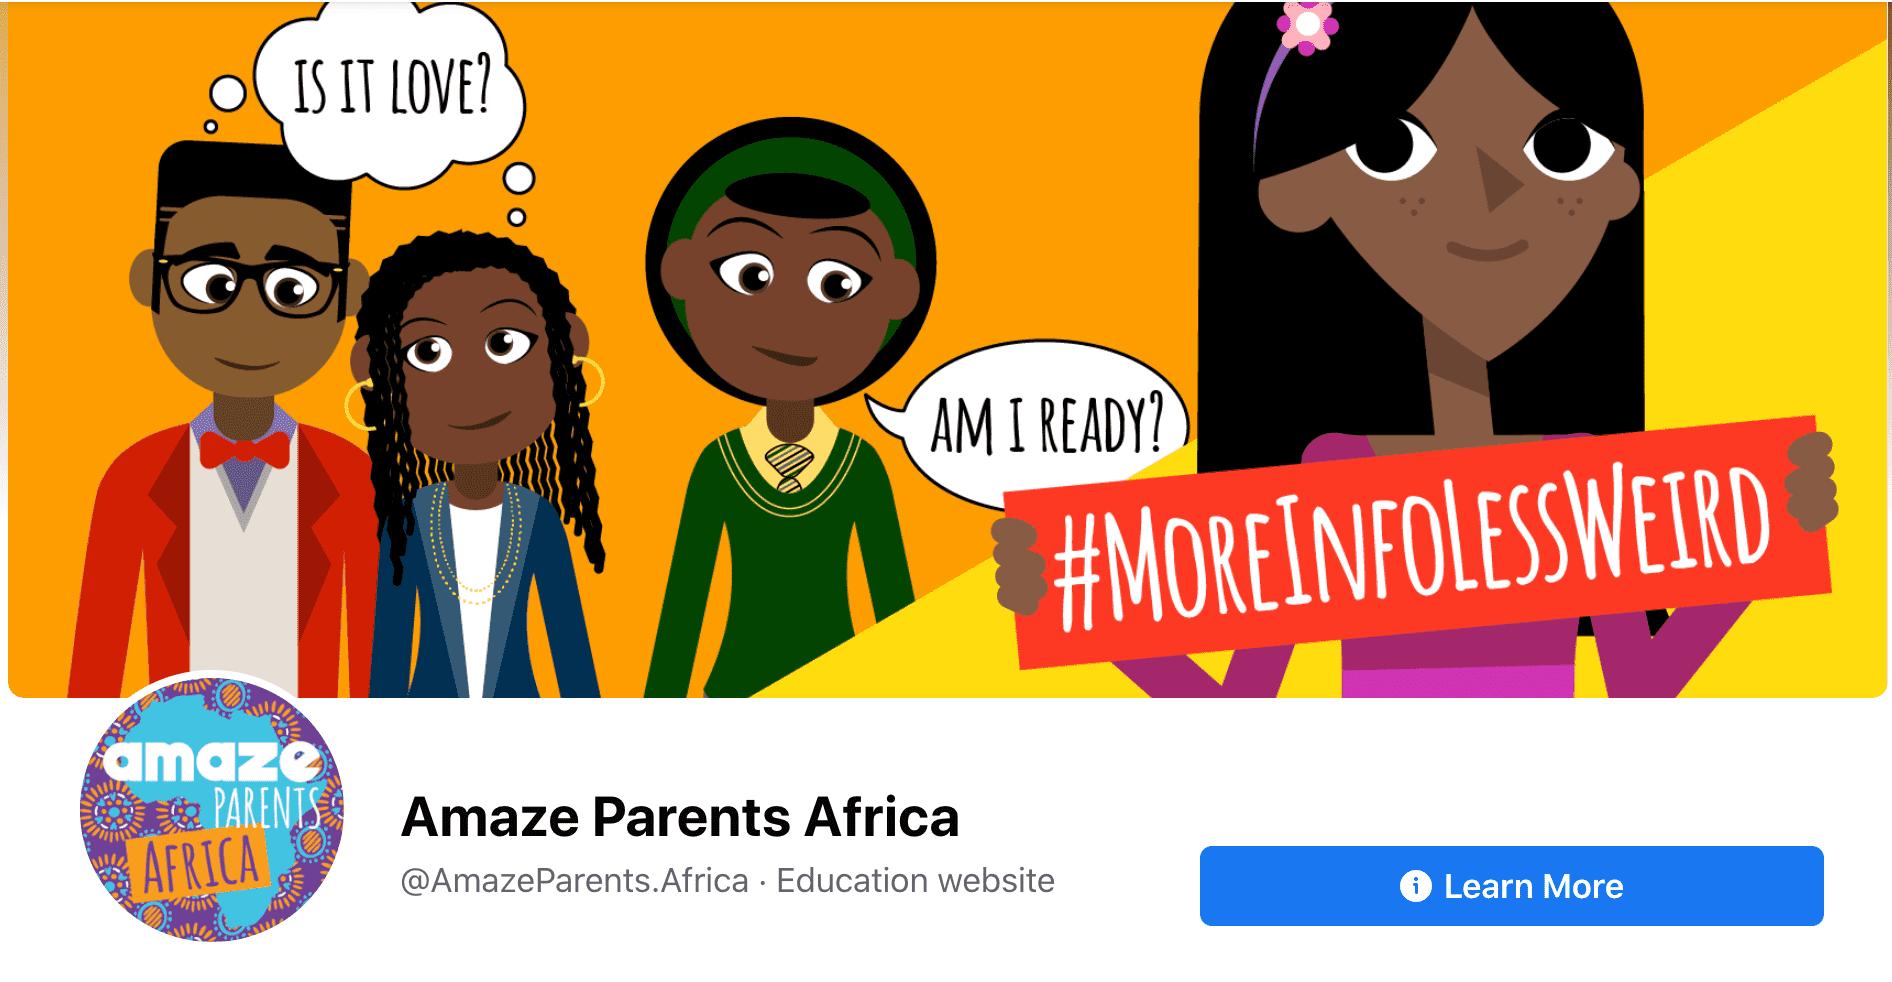 Amaze Parents Africa